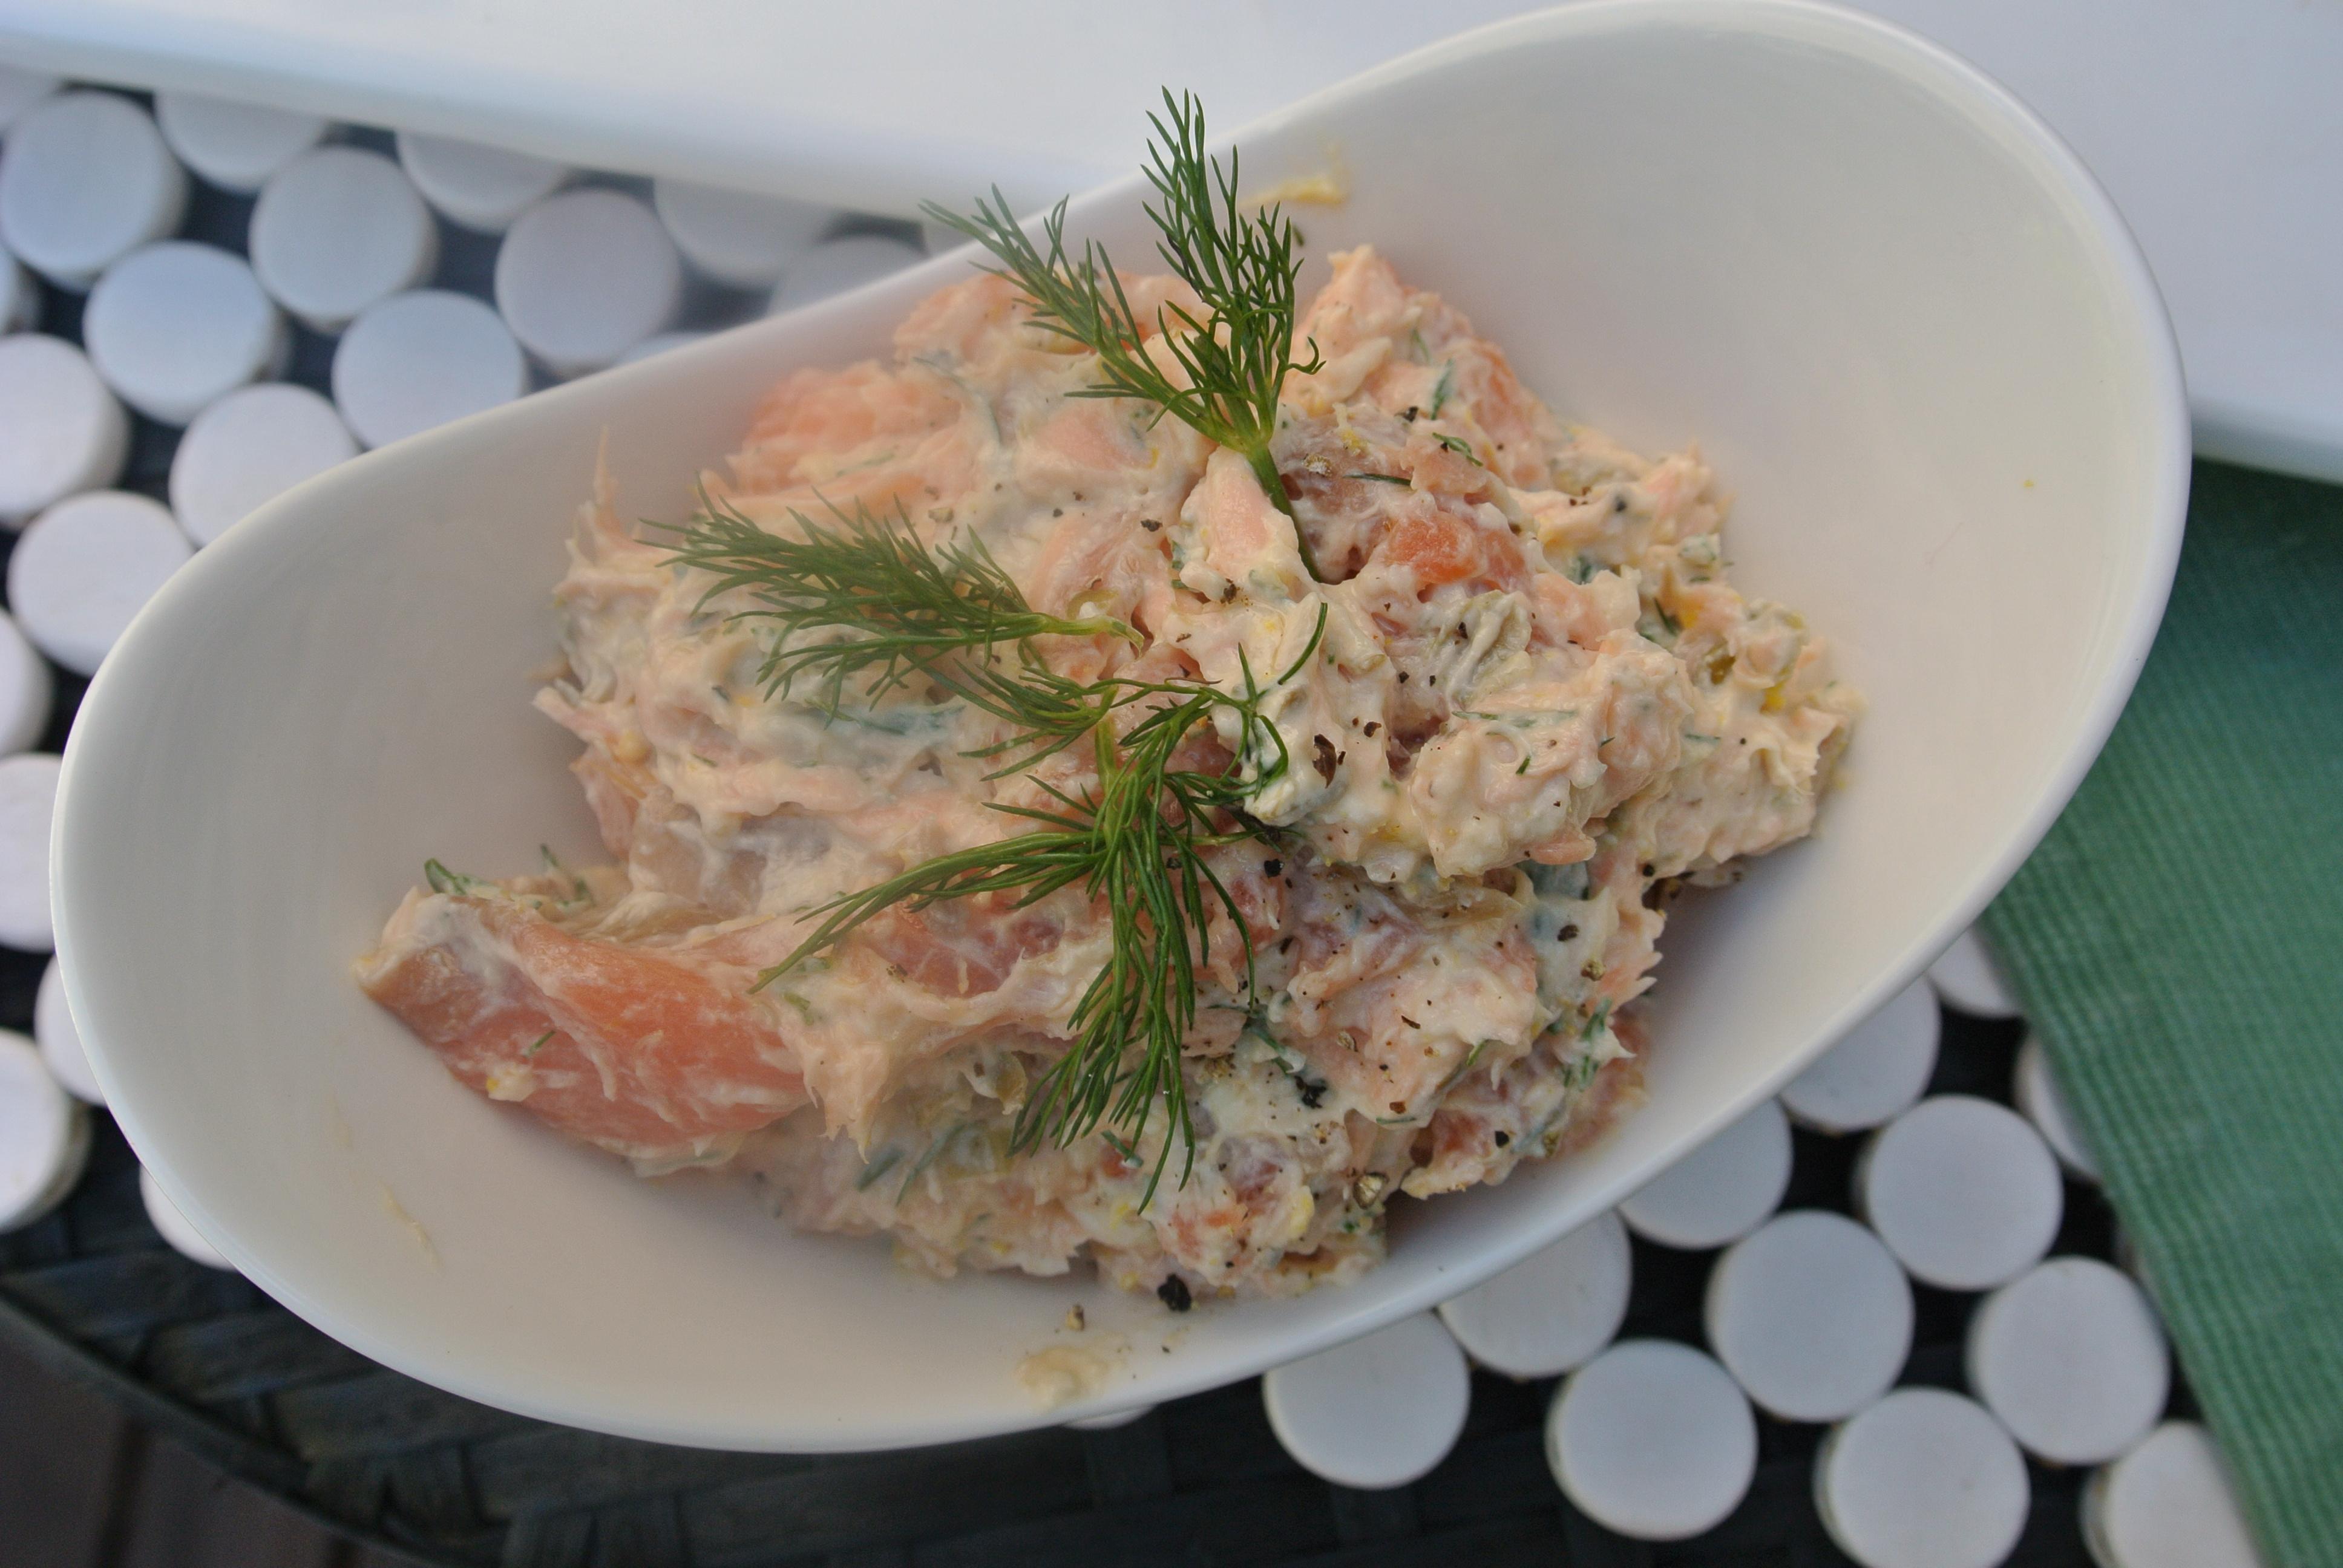 Magnificent MasterChef smoked salmon rillettes to celebrate Spring ...